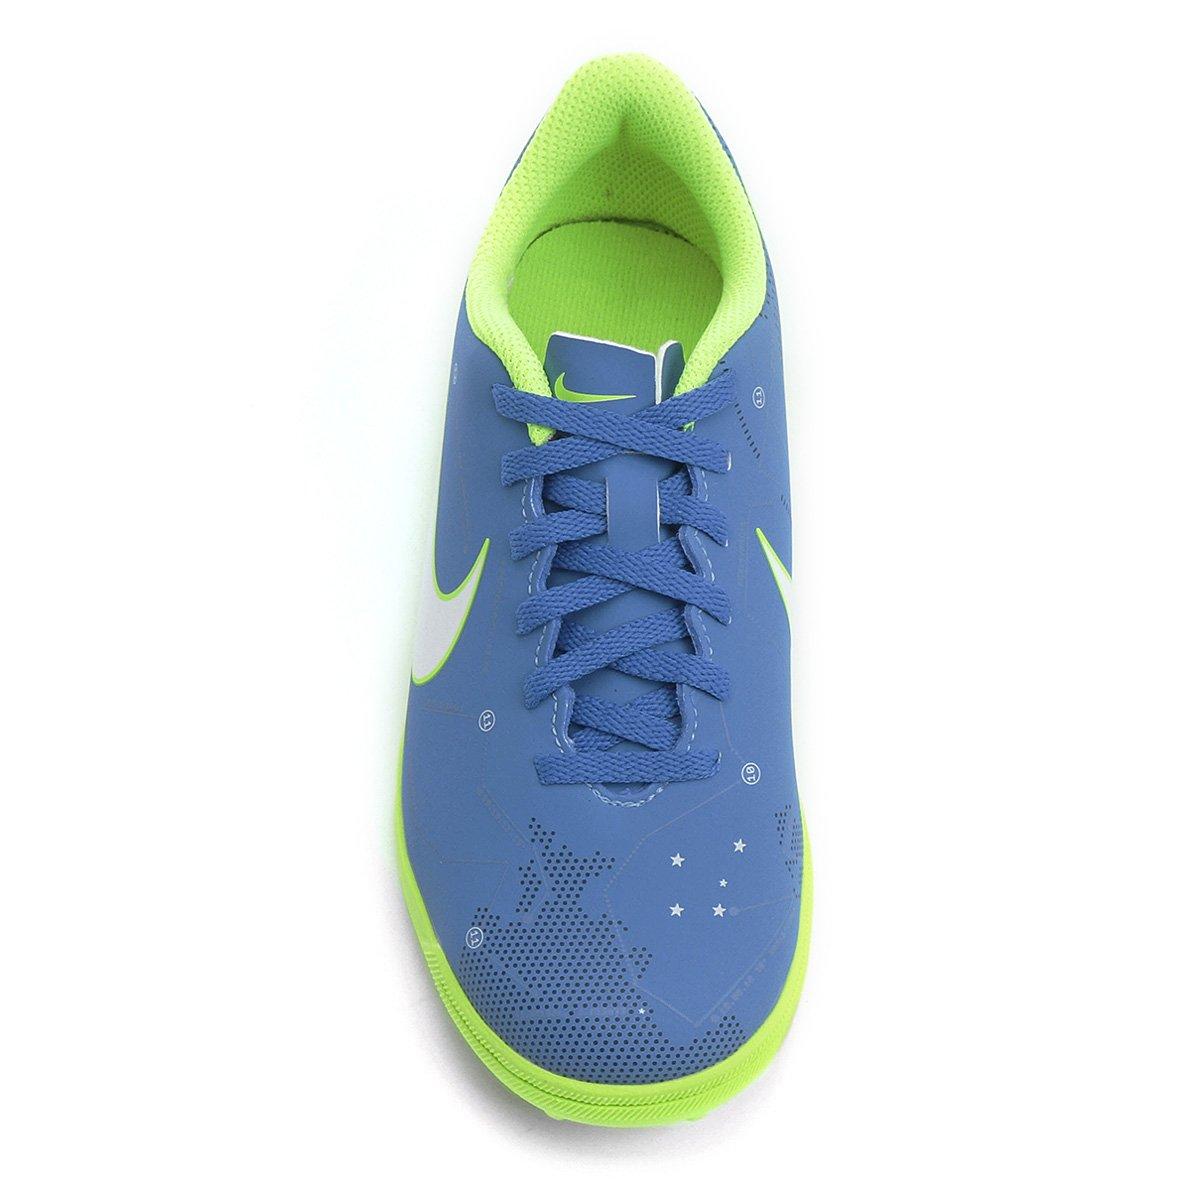 Chuteira Society Infantil Nike Mercurial Vortex 3 Neymar Jr TF ... 318c14b9447e4